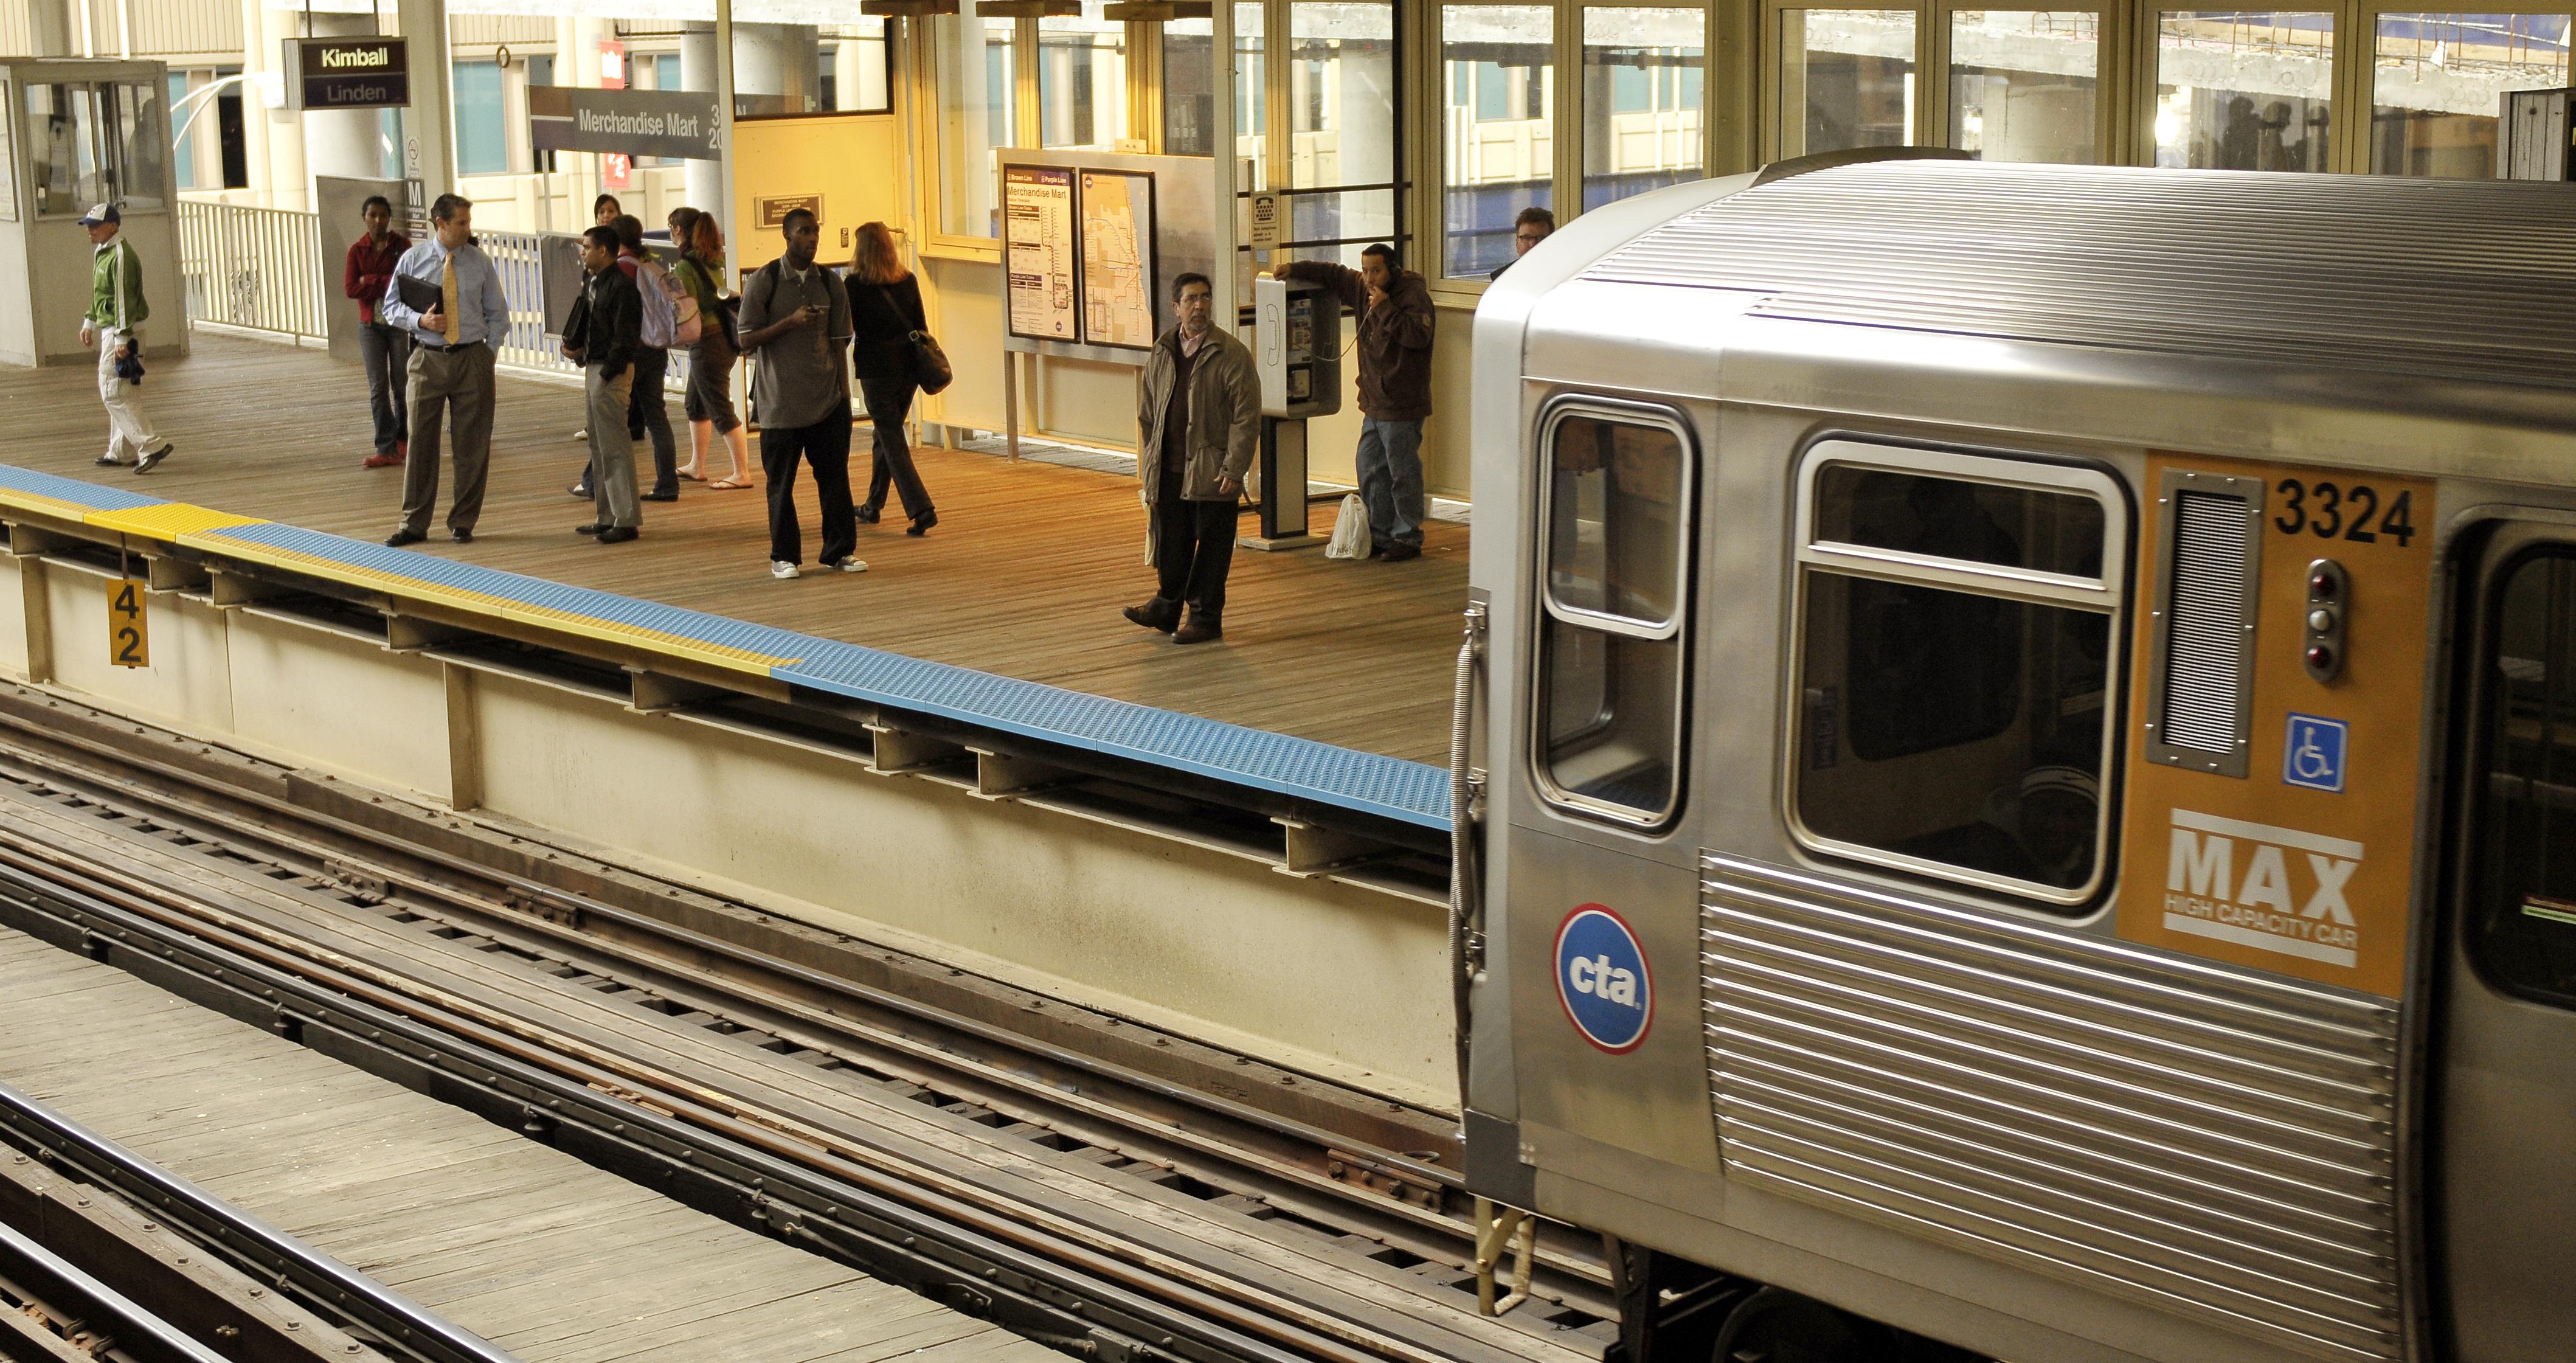 A CTA rail platform